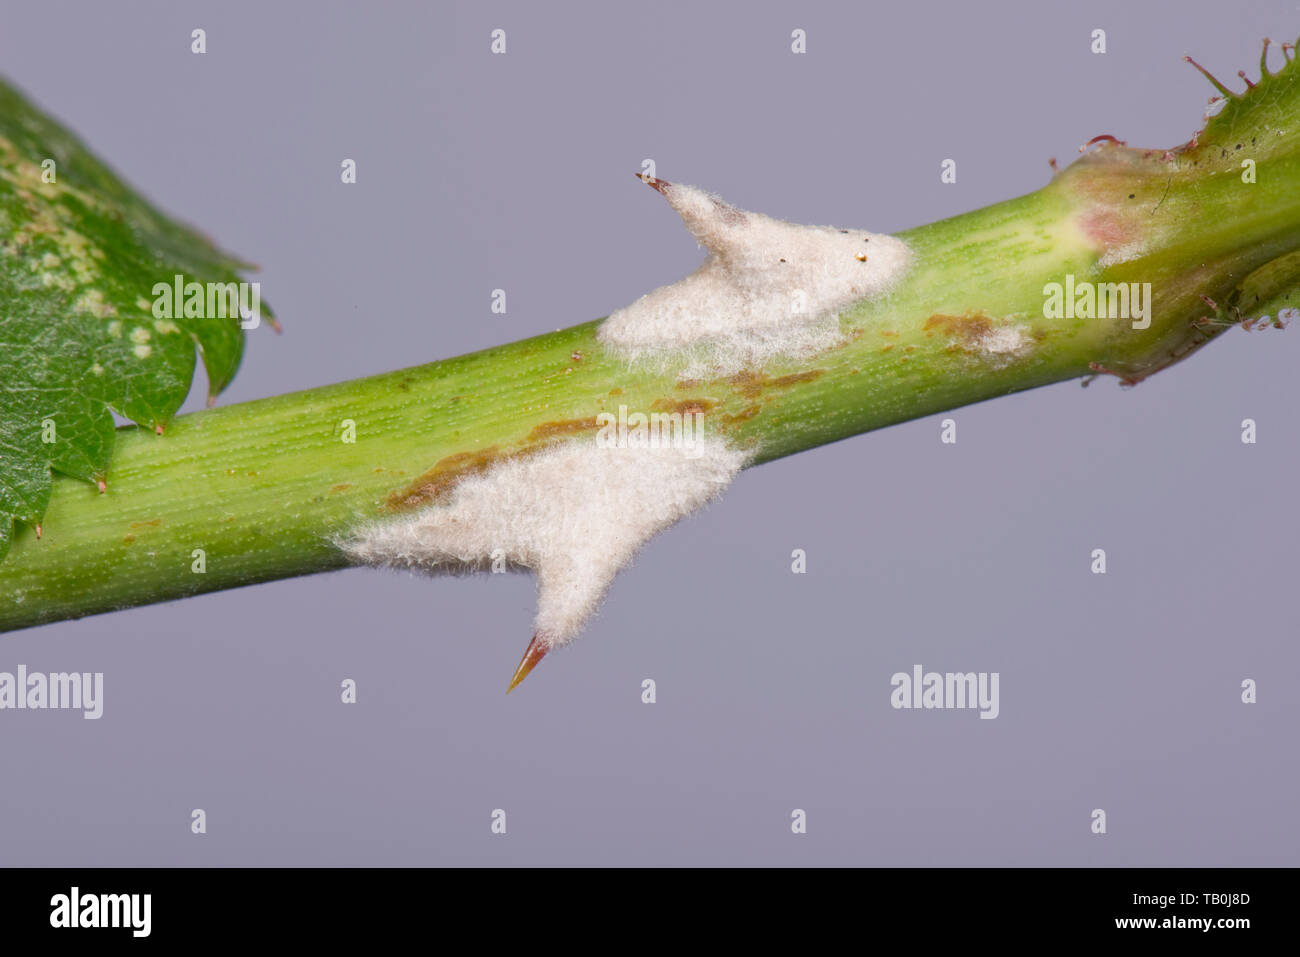 Powdery mildew, Podosphaera pannosa, fungal disease on and around rose thorns, Rosa 'American Pillar' - Stock Image